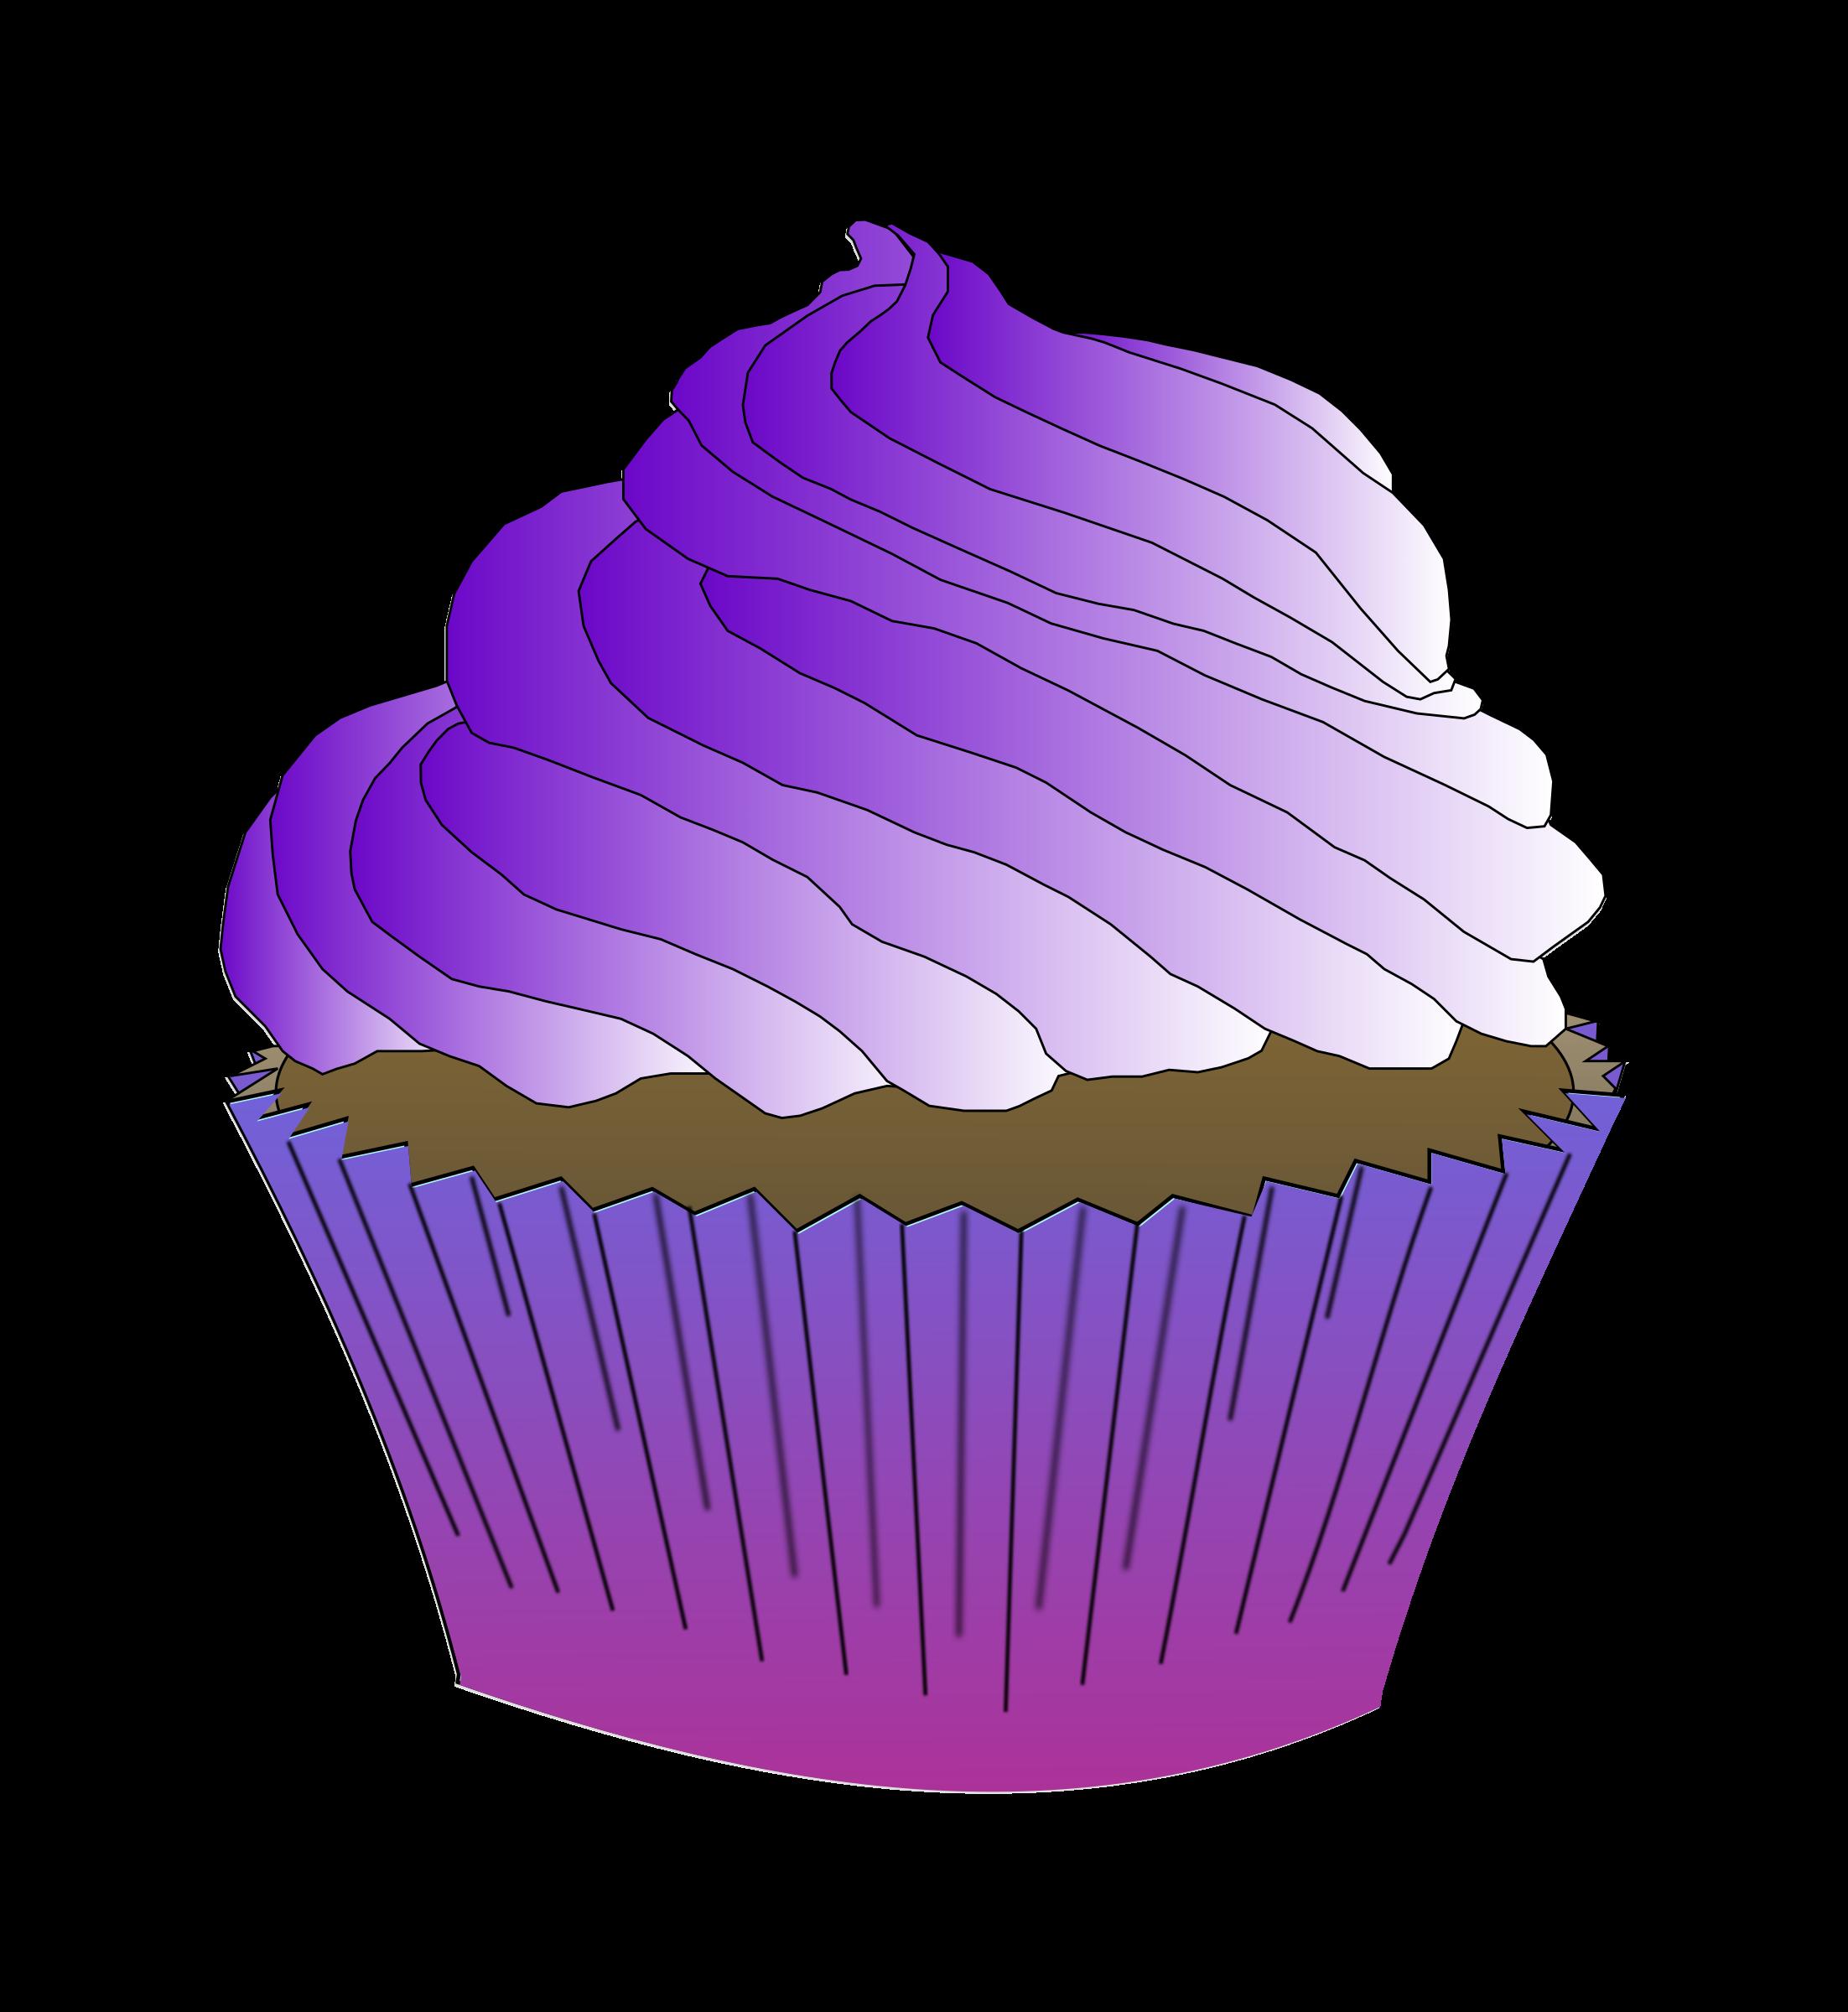 Chocolate purple cupcake big. Cupcakes clipart buttercream